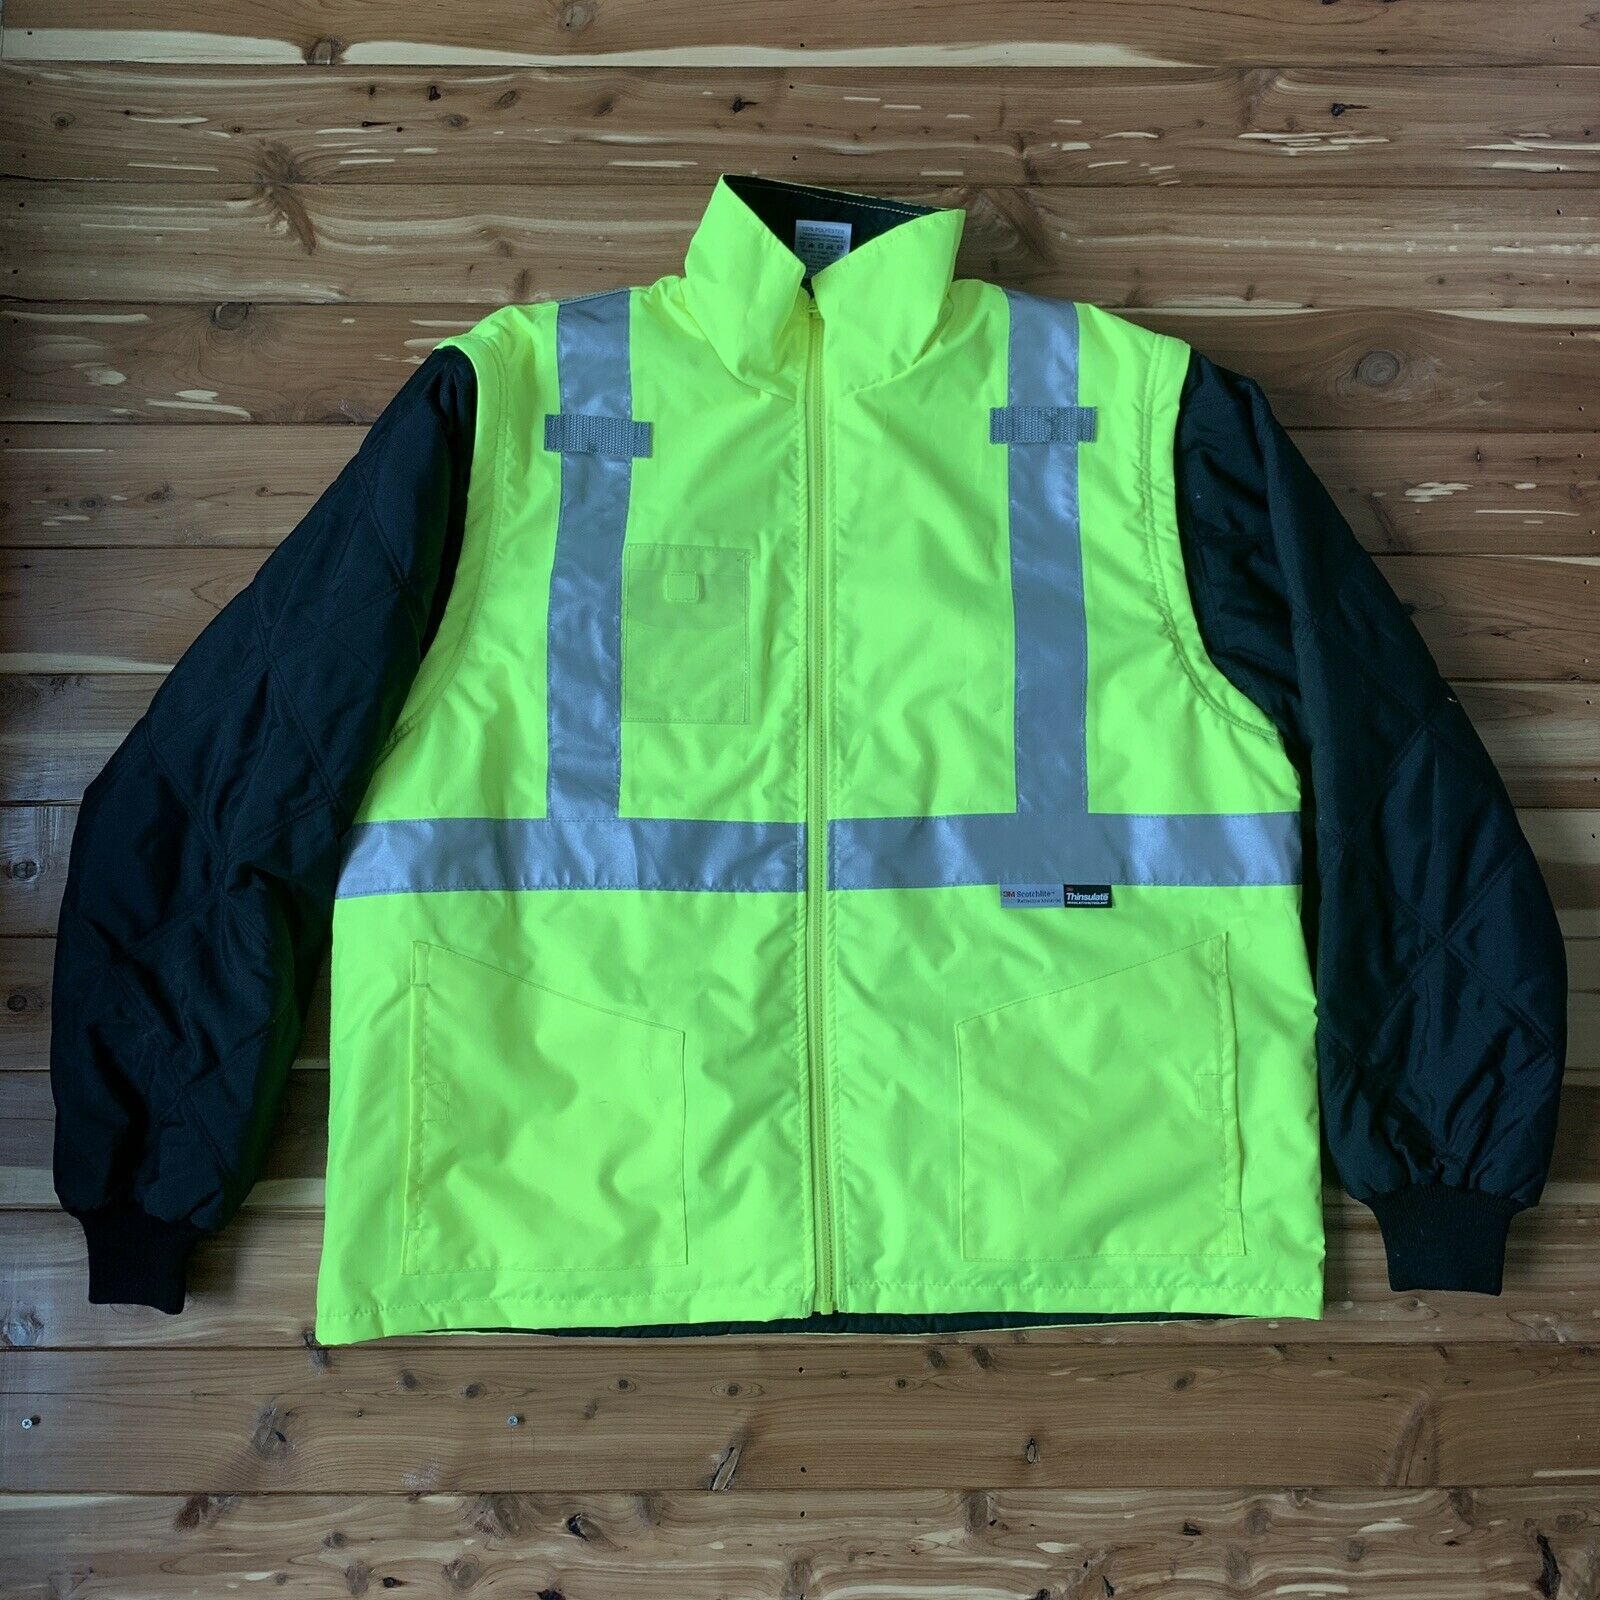 Ergodyne Glowear 8287 Class 2 Type R Convertible Thermal Hi Vis Jacket Vest For Sale Online